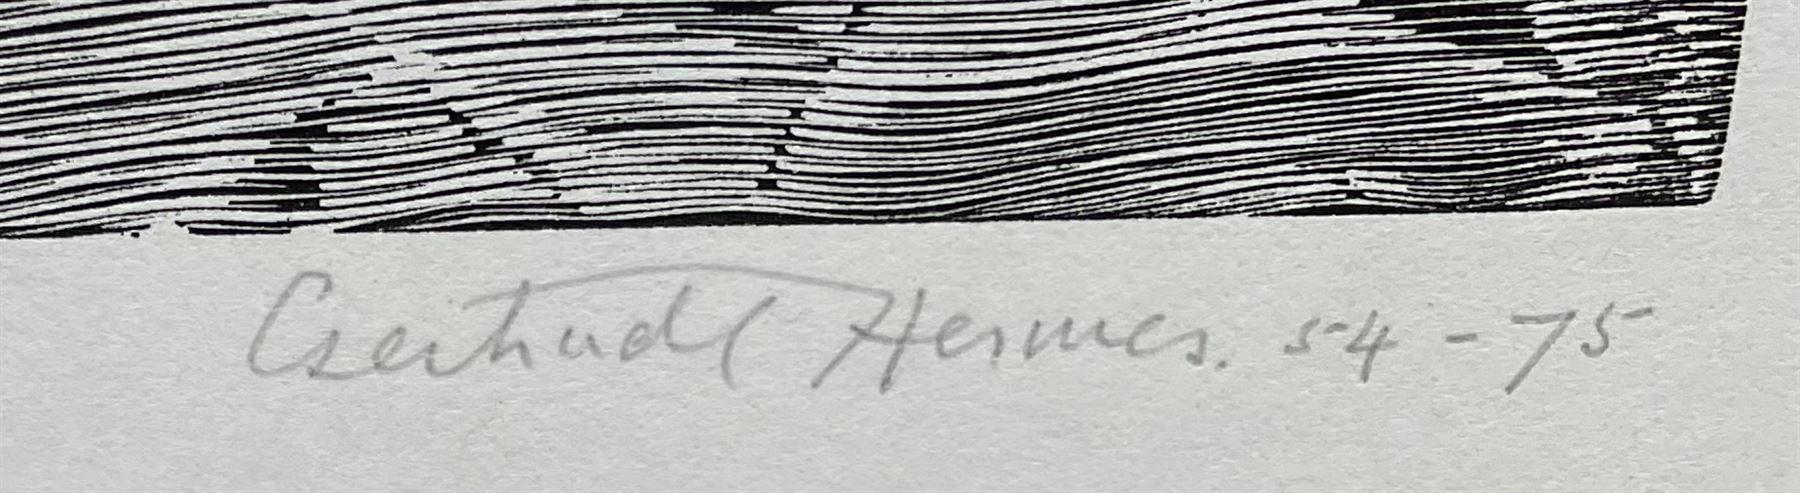 Gertrude Hermes OBE RA (British 1901-1983): 'The Yoke' - Image 2 of 3